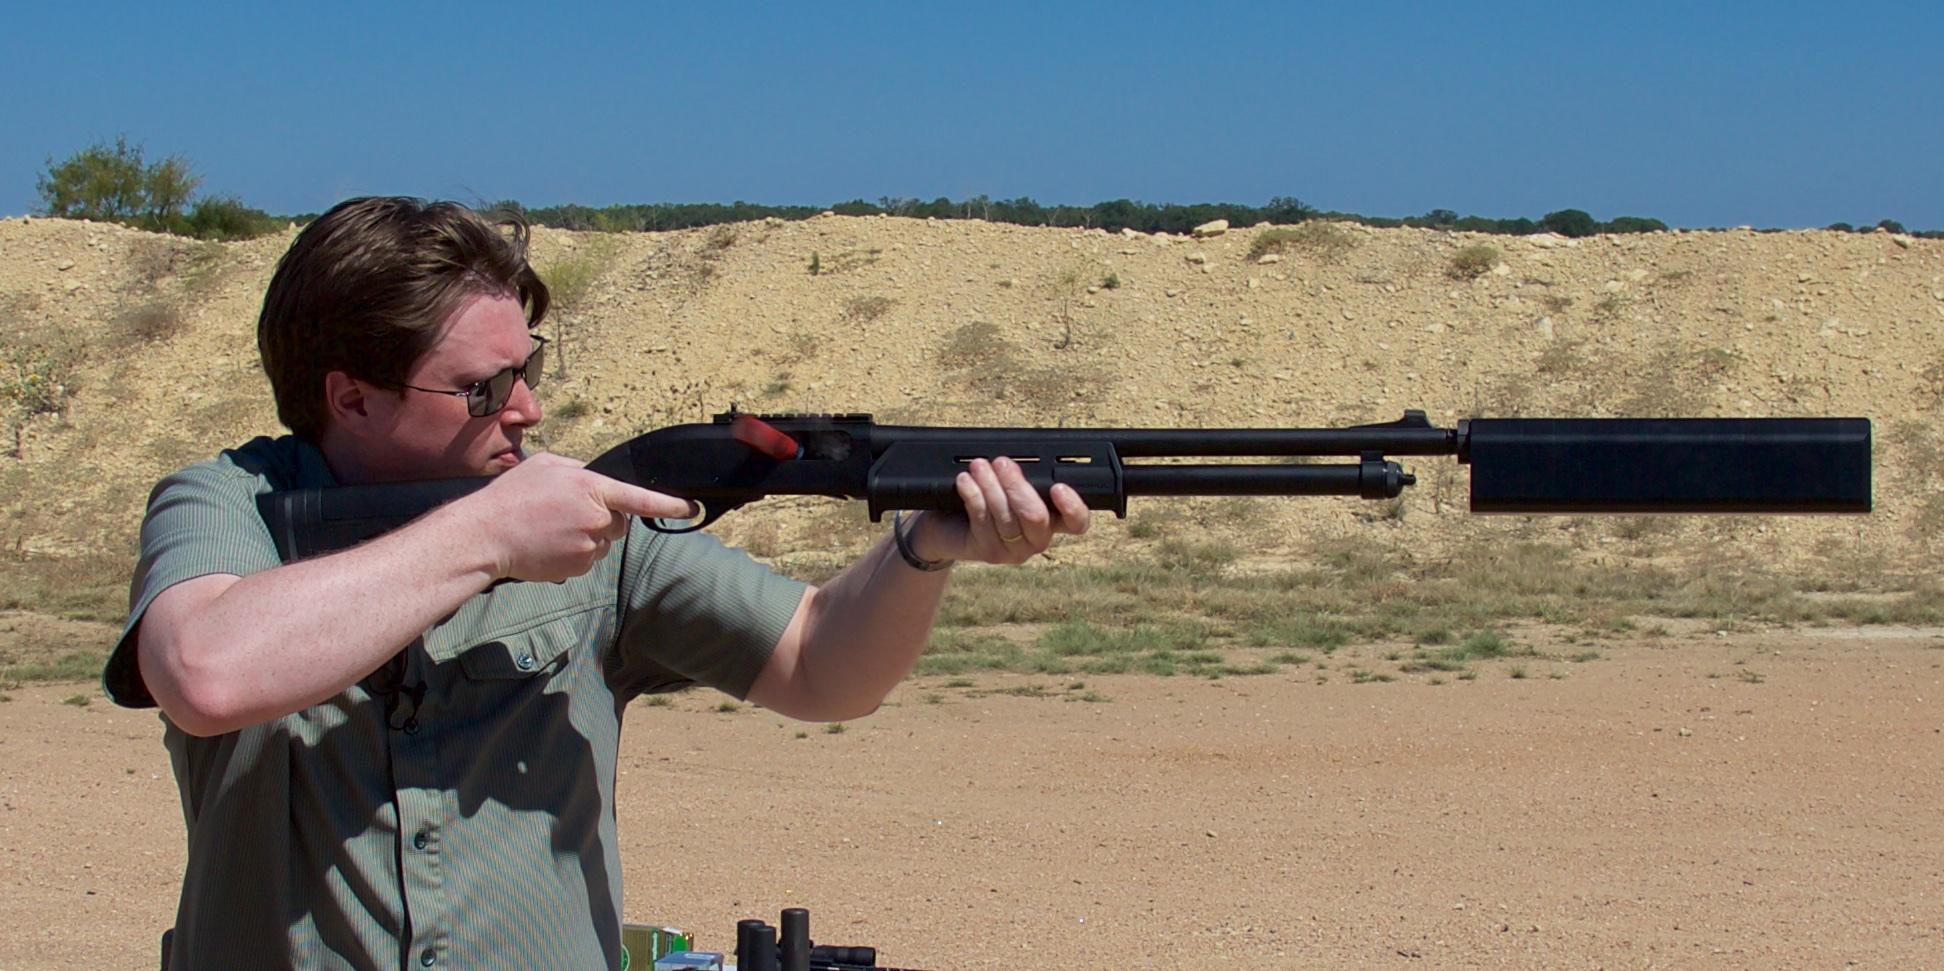 ARES Defense FightLite Industries STEP-22 Silenced Pistol (courtesy  ammoland.com)